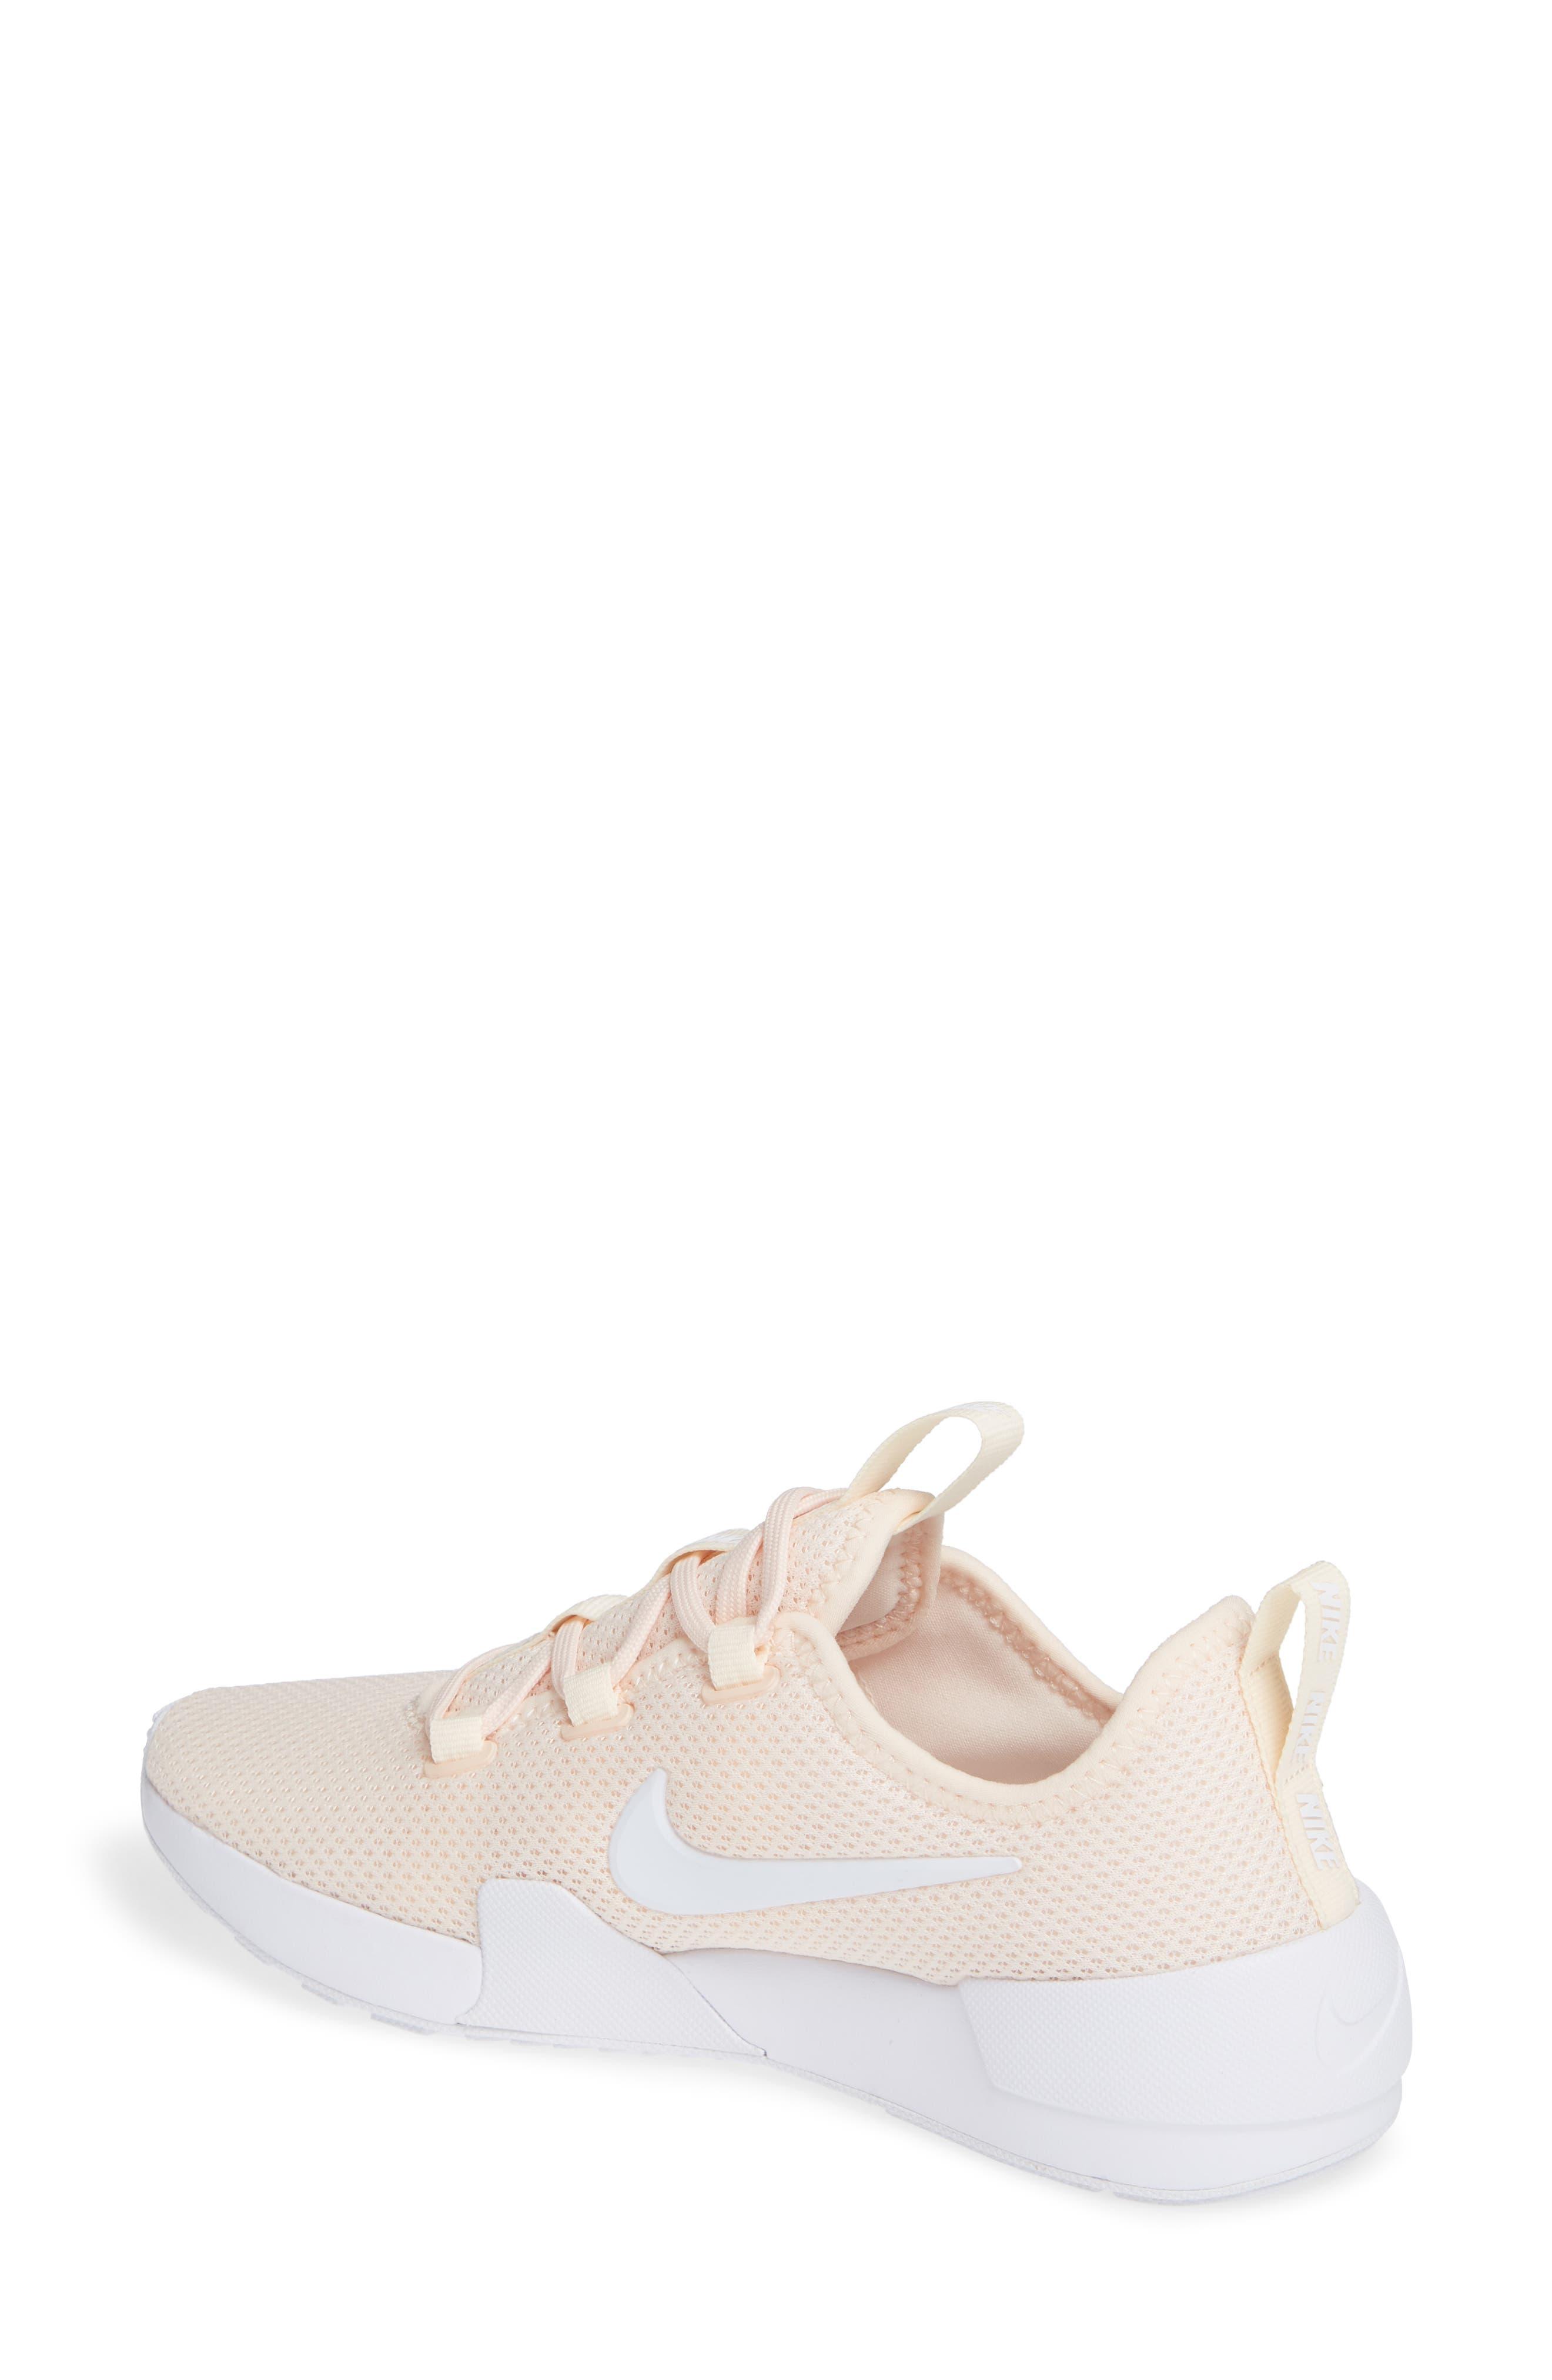 Ashin Modern Shoe,                             Alternate thumbnail 2, color,                             Guava Ice/ White/ White